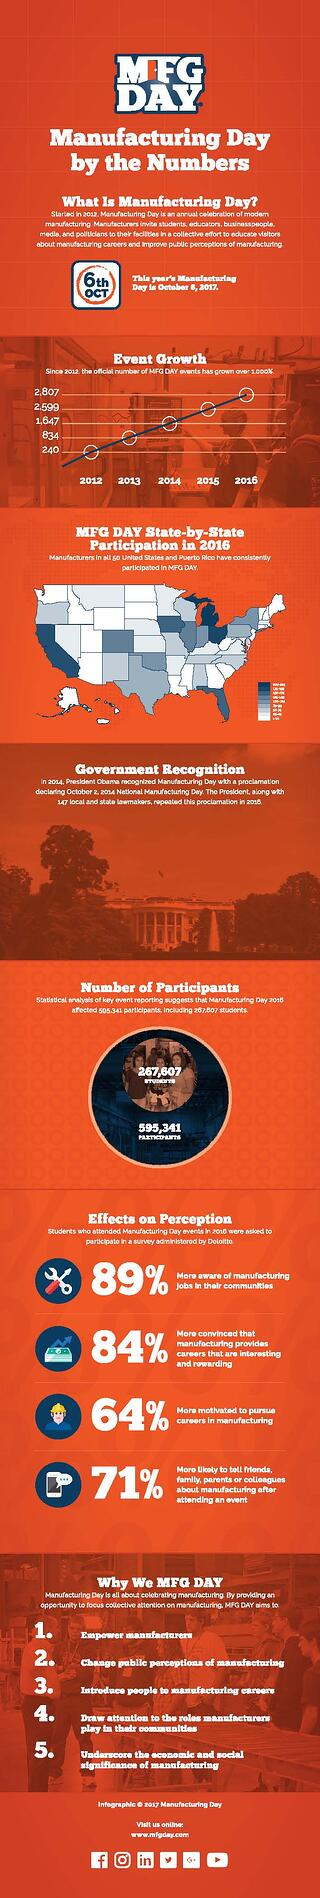 MFG-DAY-Infographic.jpg